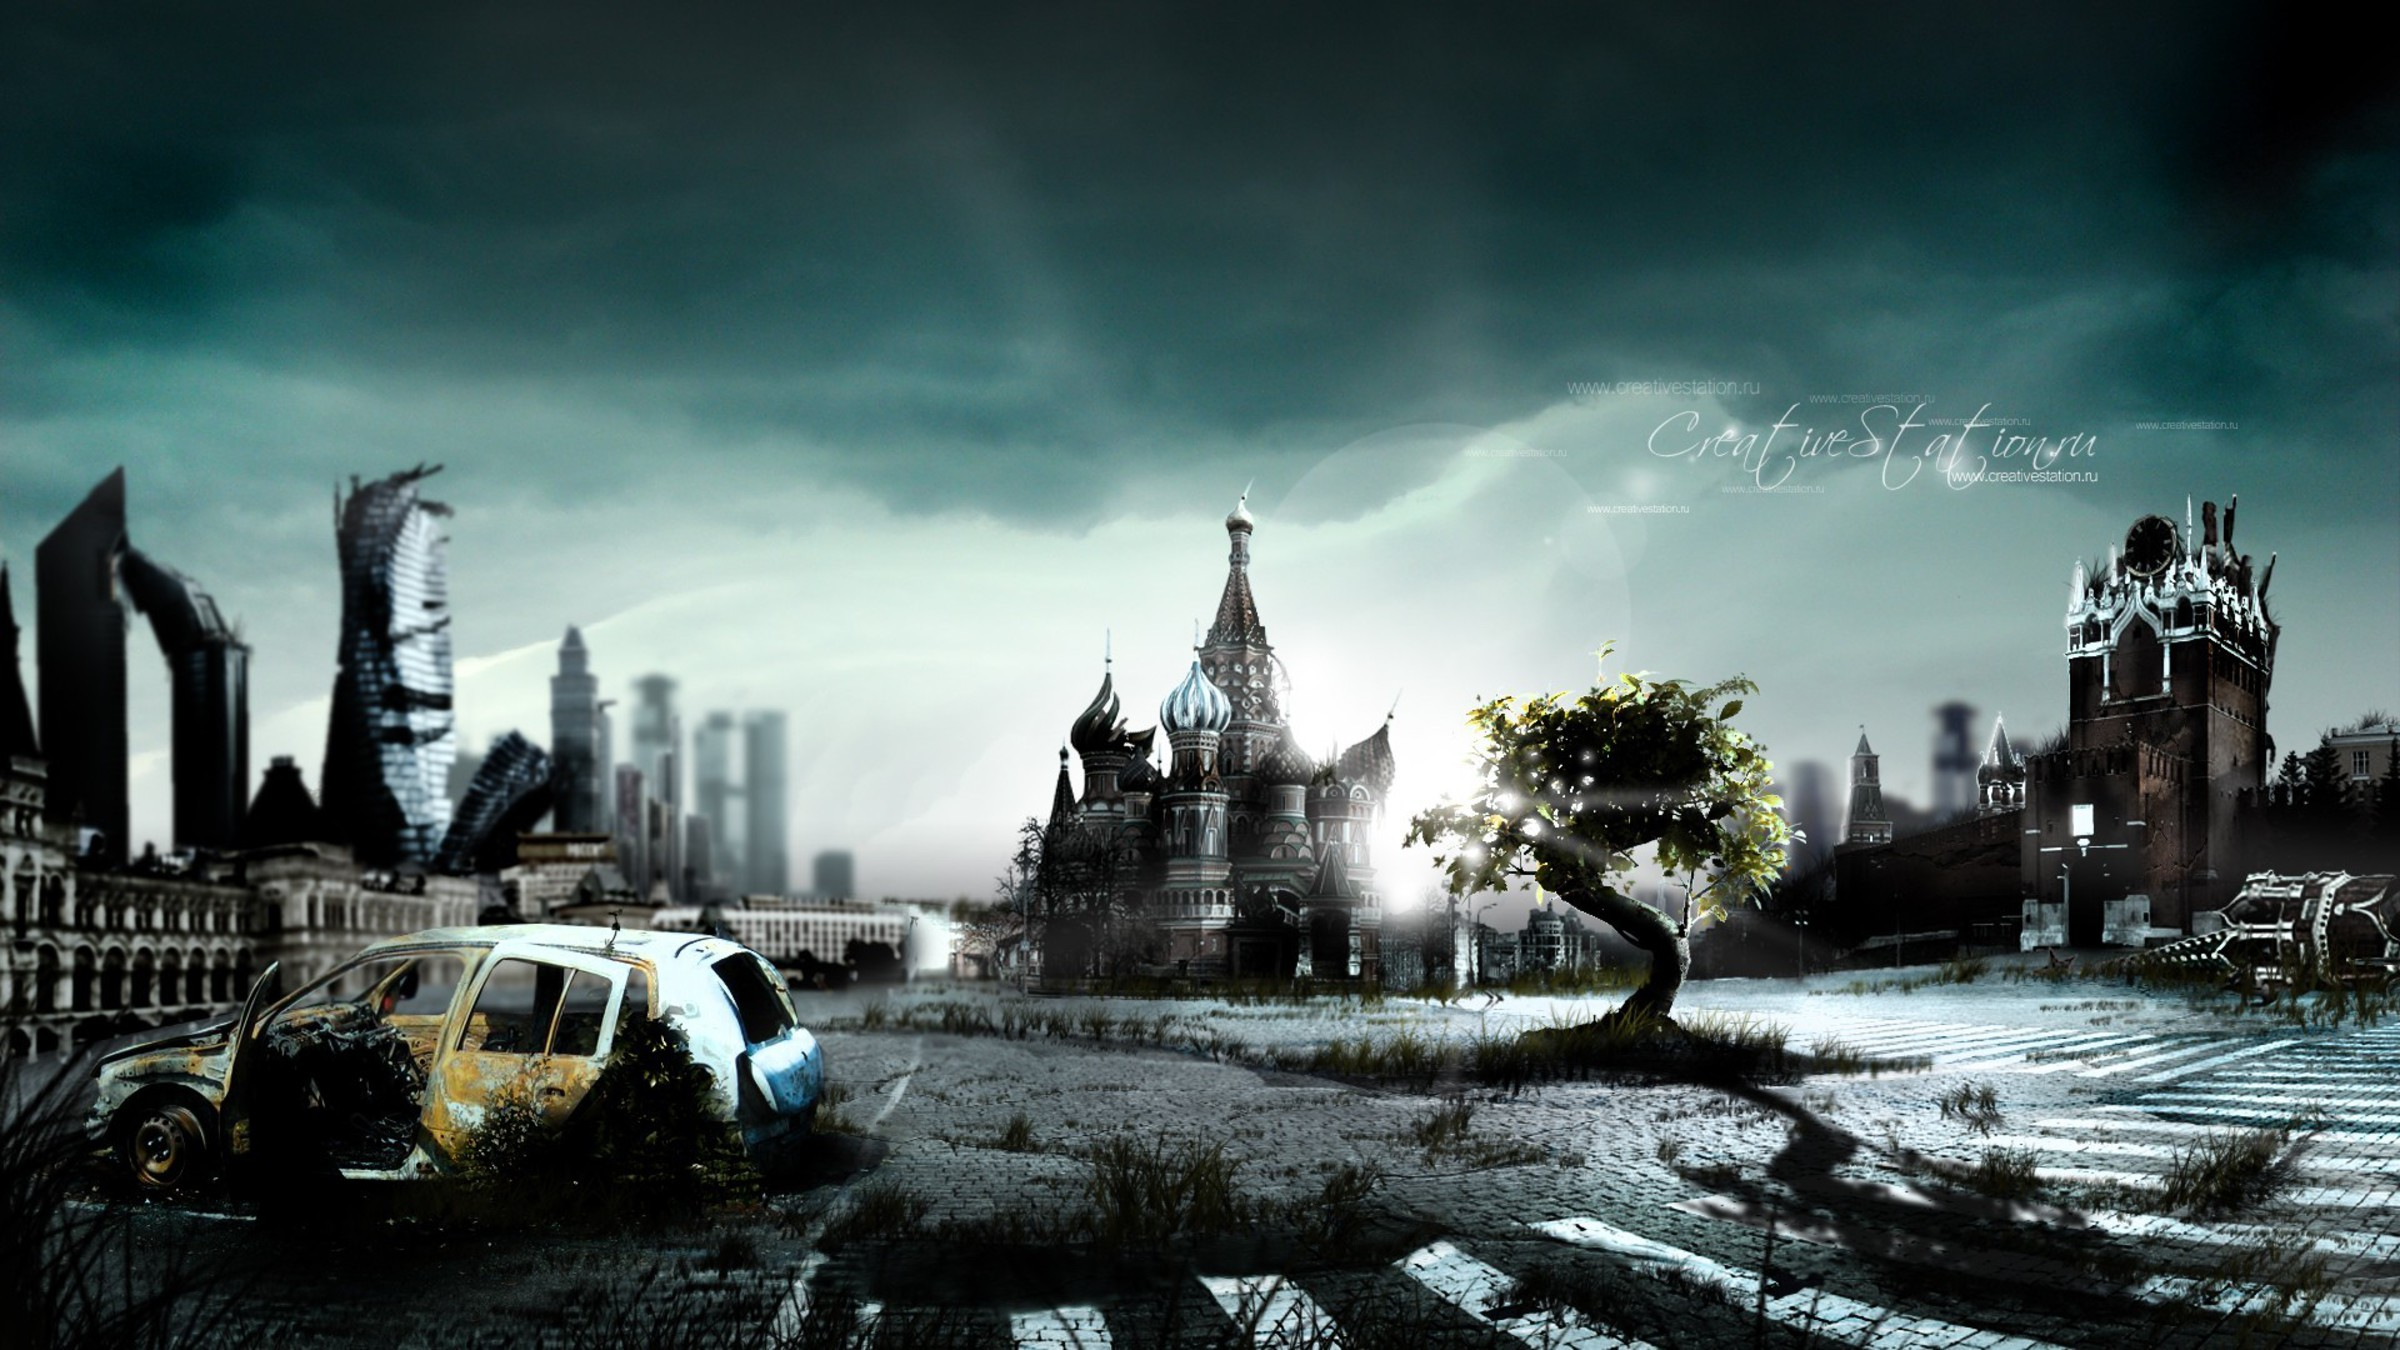 Апокалипсис (фильм)